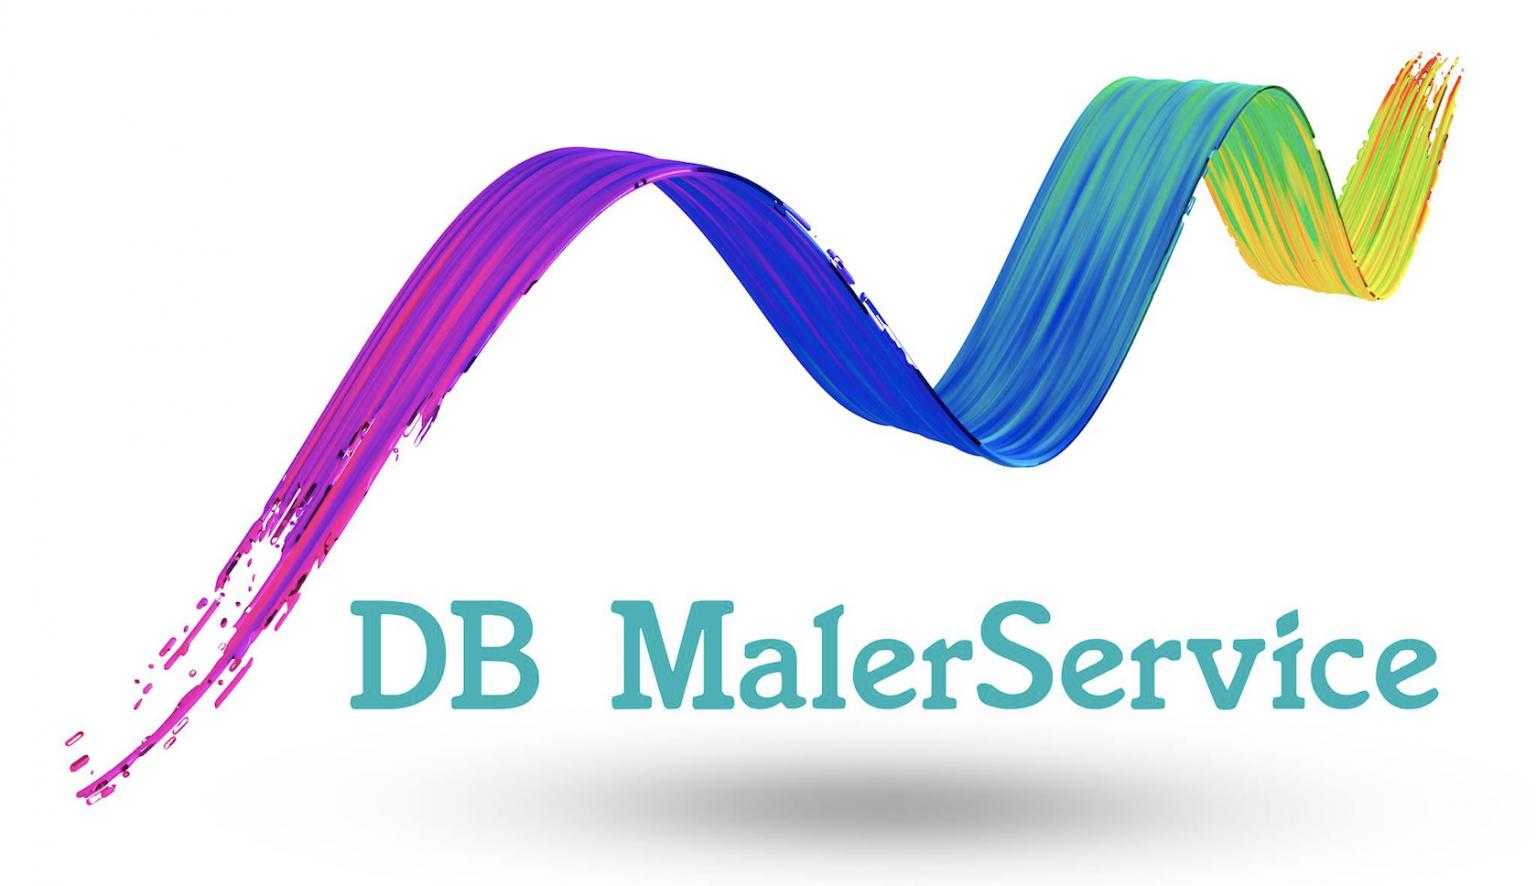 DB Maler Service Banner